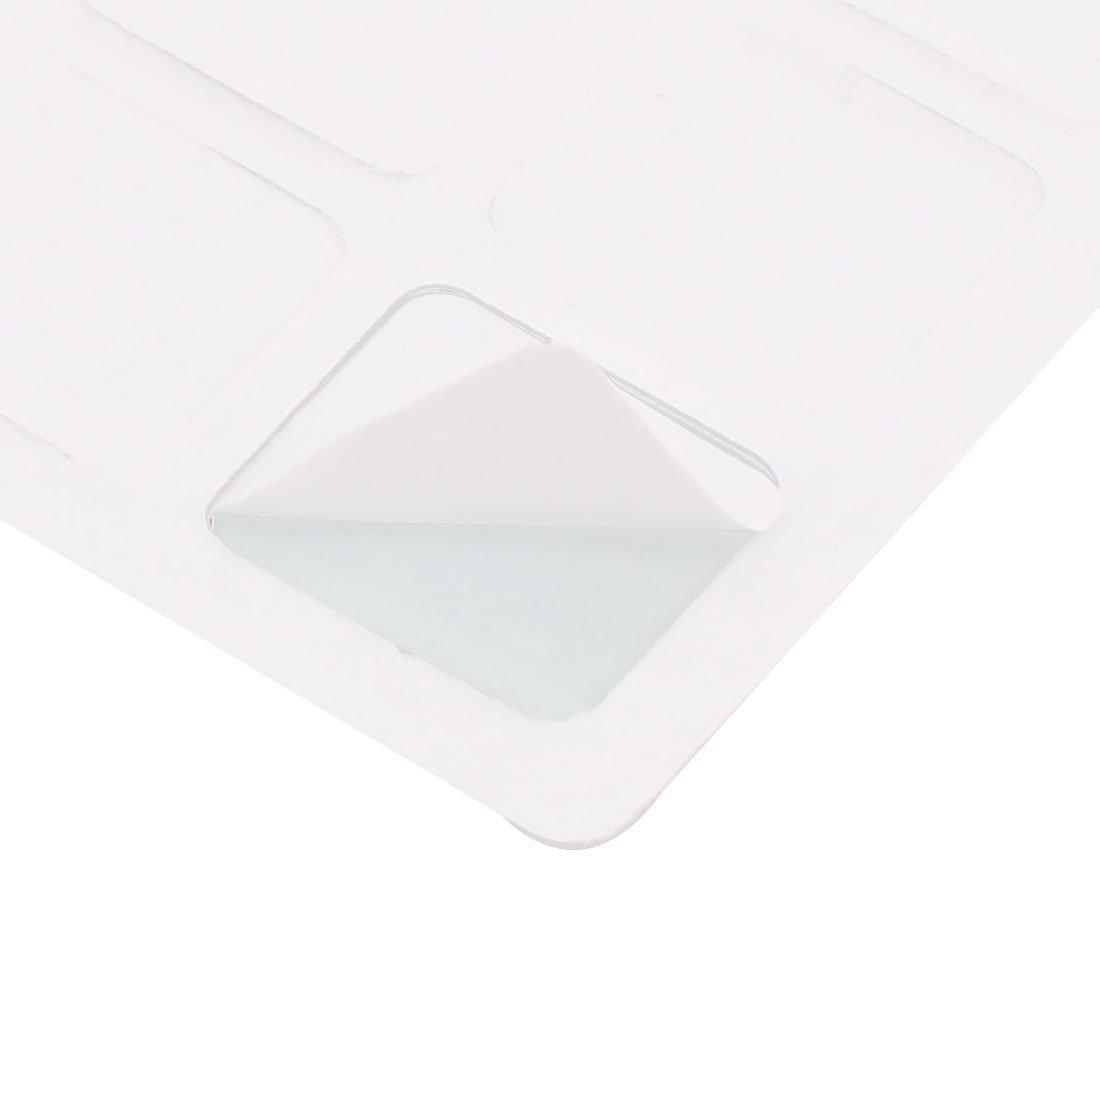 Amazon.com: eDealMax Portátil plástico antideslizante extraíble ordenador Tradicional China del carácter del teclado etiqueta Protector Negro: Electronics